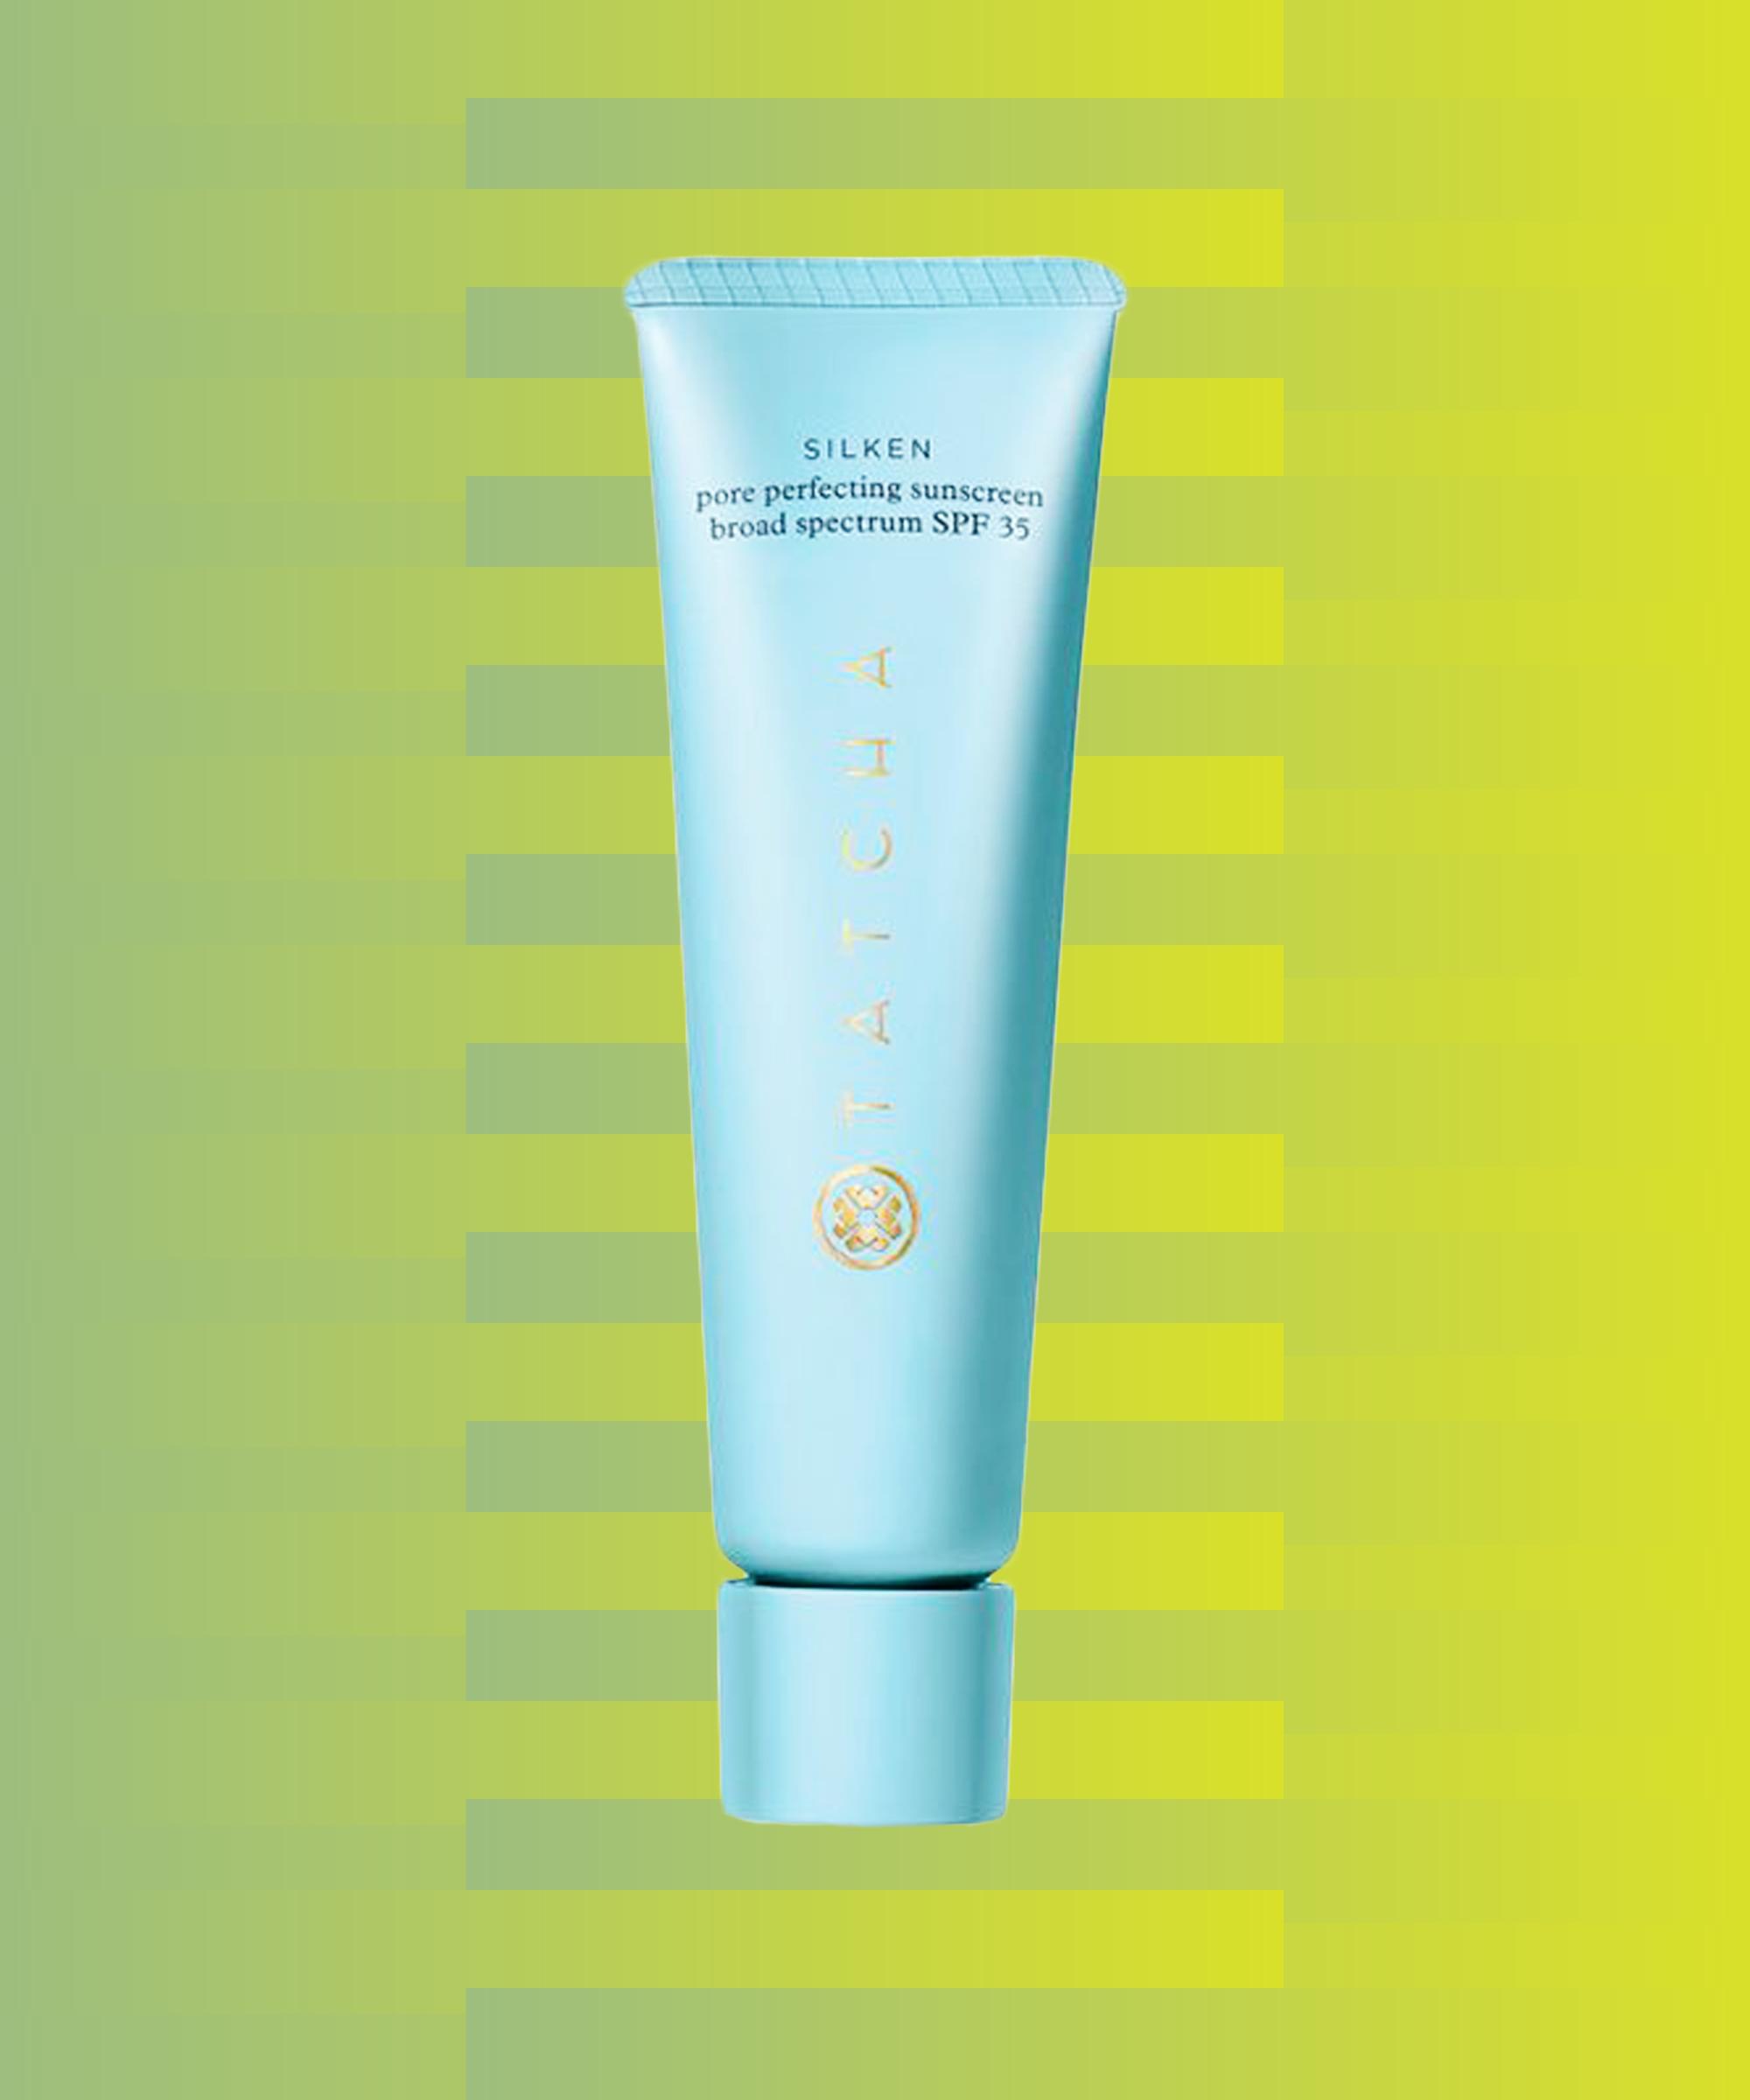 Tonal cream for problem skin: quality choice, correct application